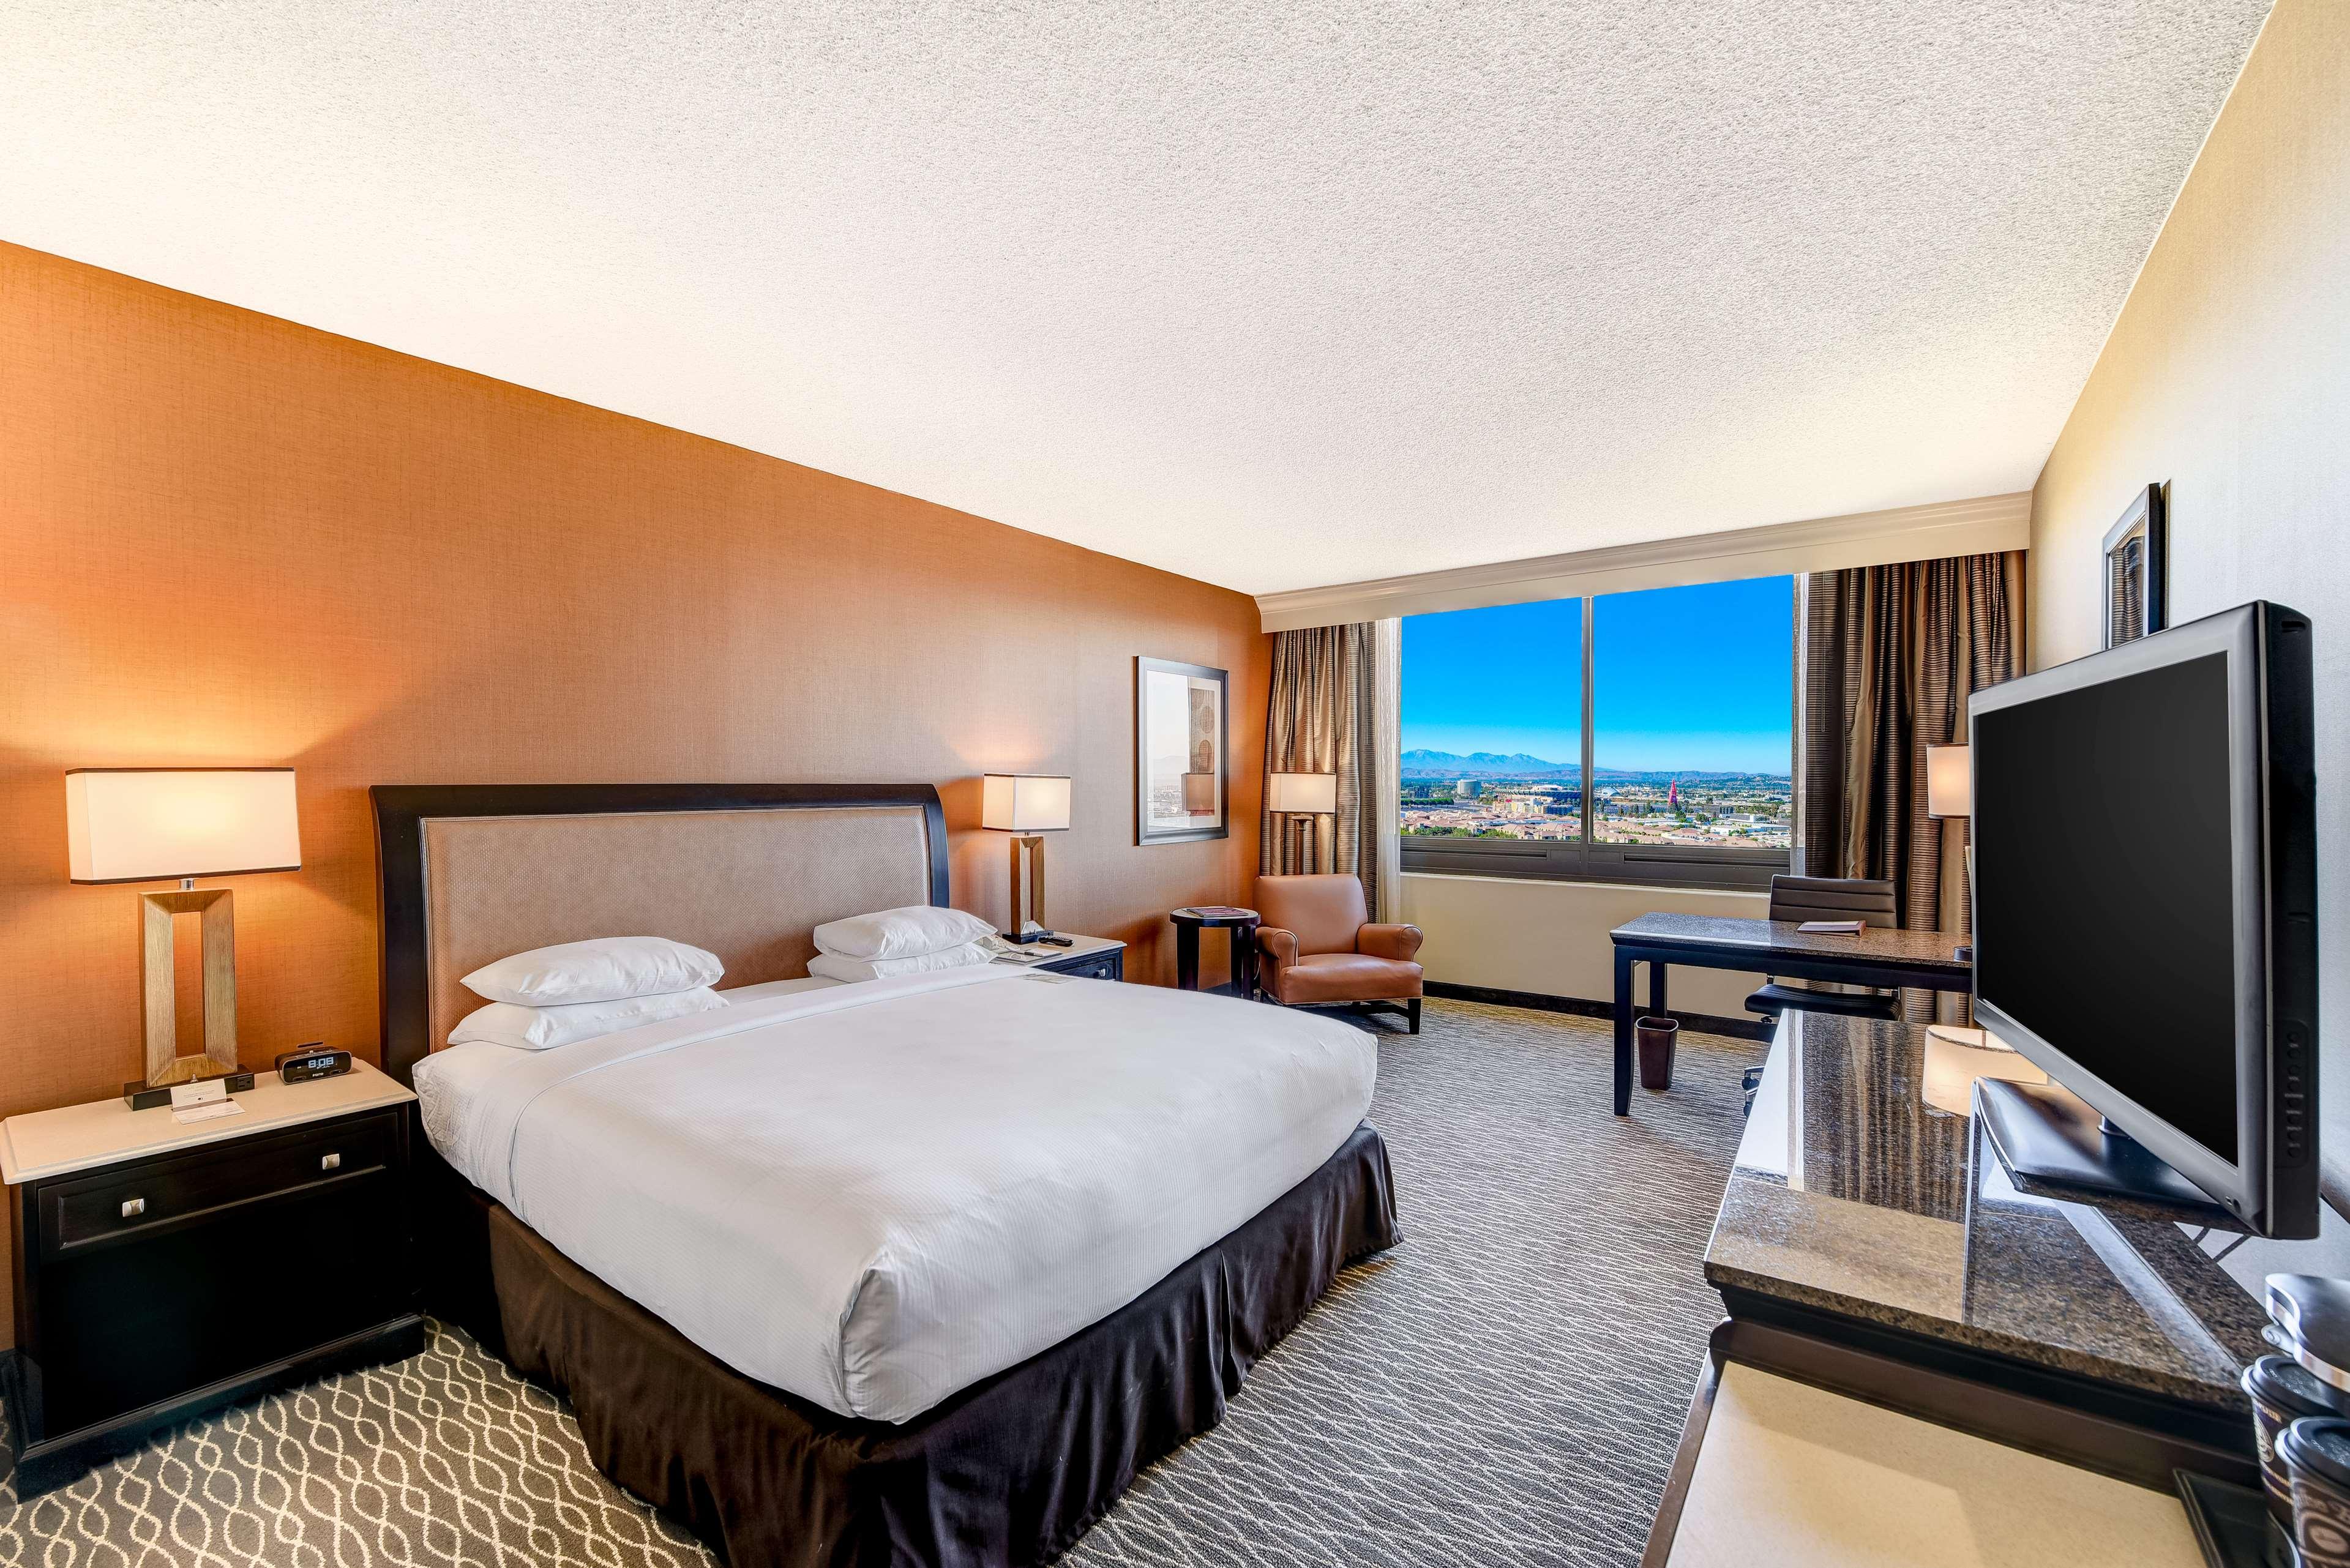 DoubleTree by Hilton Hotel Anaheim - Orange County image 45